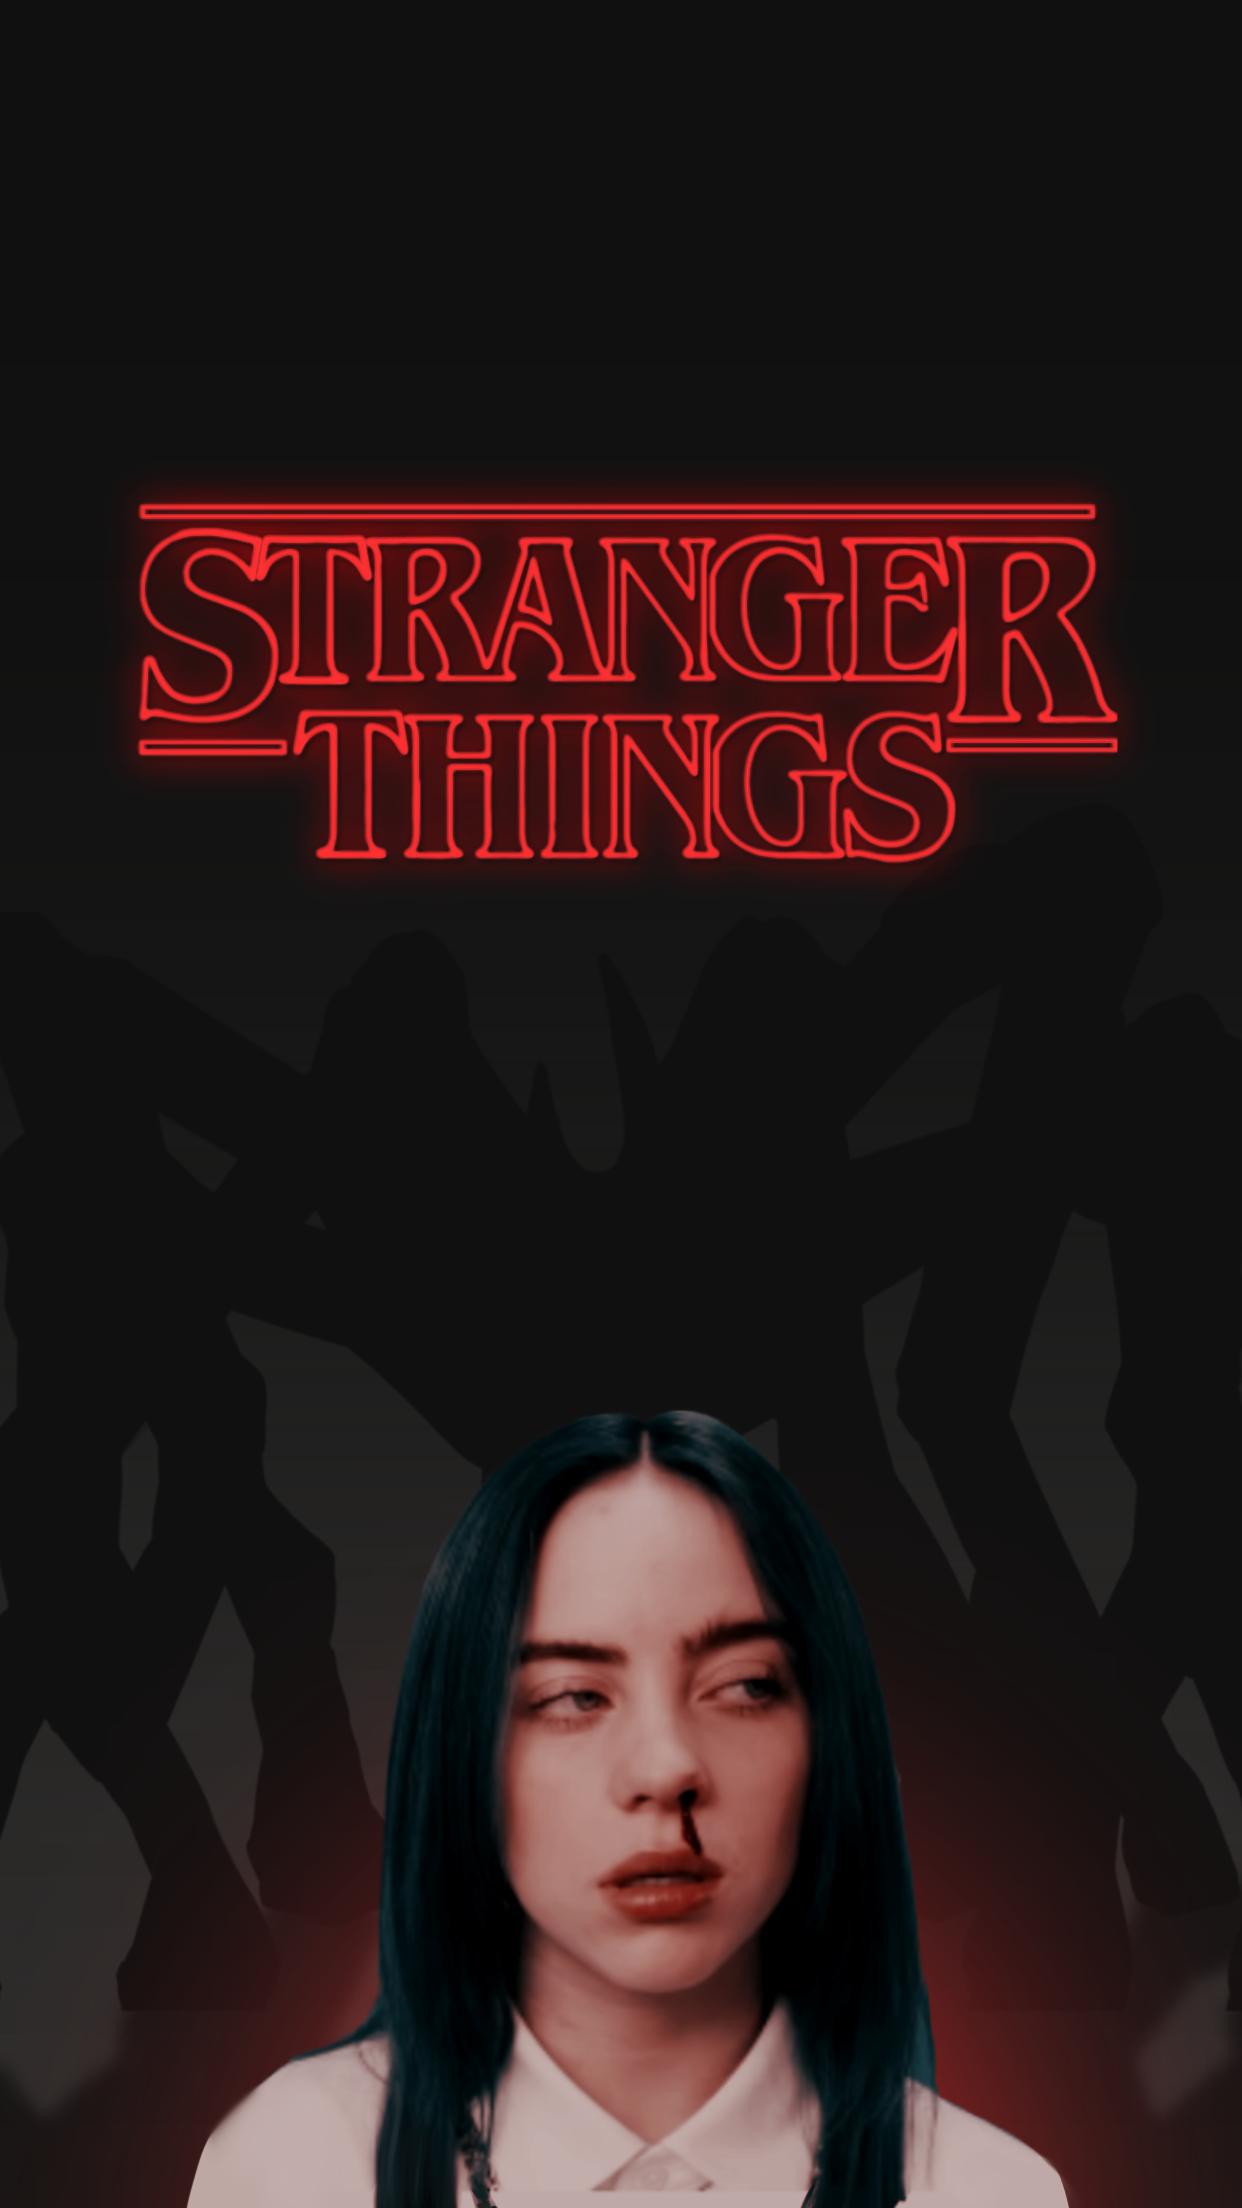 Stranger Things X Billie Eilish Iphone Wallpaper Stranger Things Stranger Wallpaper